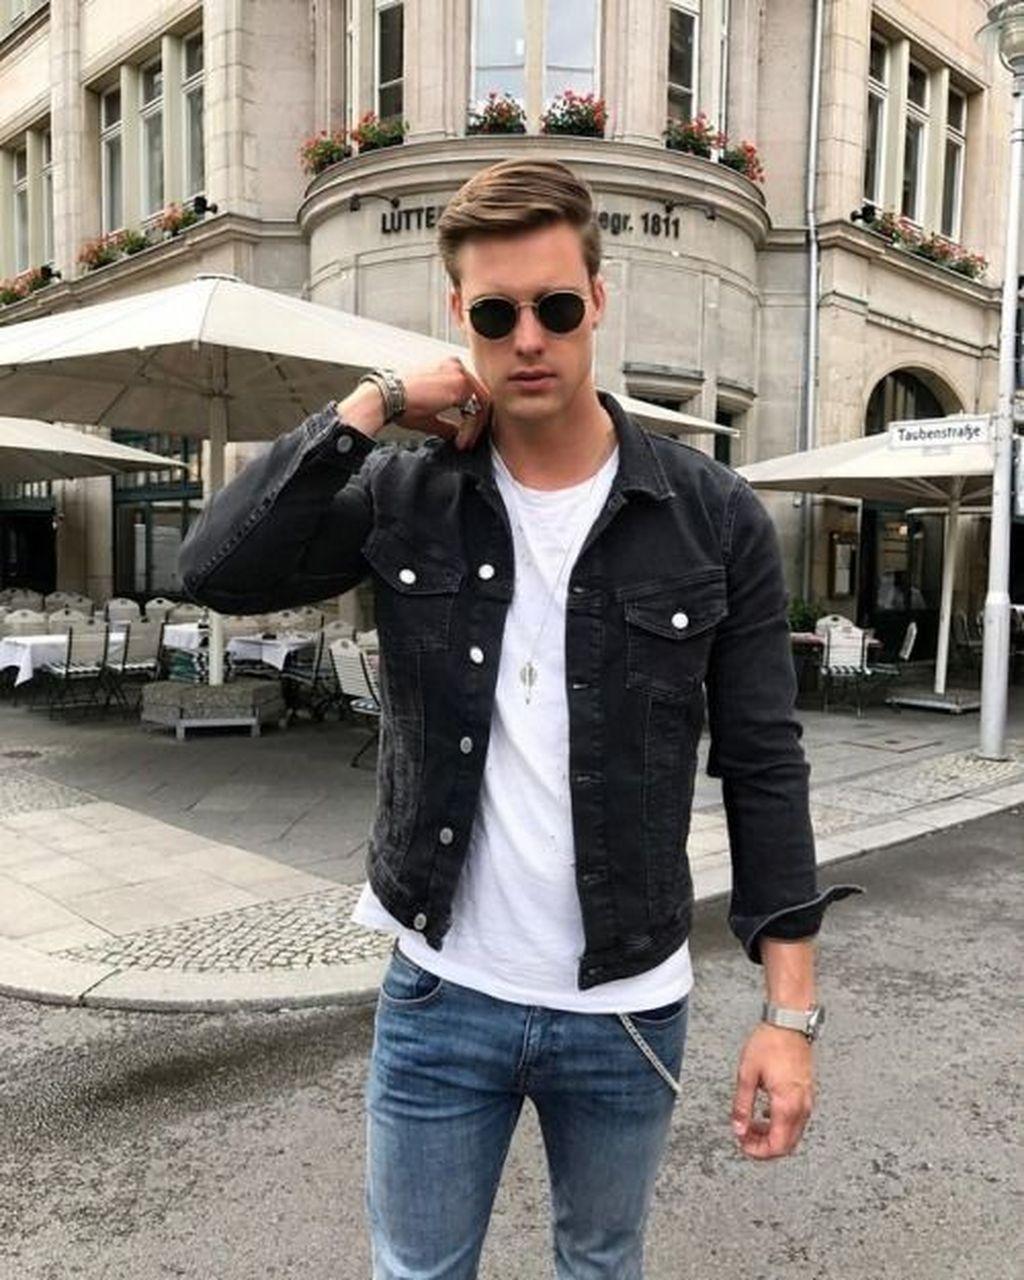 20 Elegante Mens Stili Di Moda Utilizzando Denim Giacche Stylish Mens Fashion Black Denim Jacket Men Denim Jacket Men [ 1280 x 1024 Pixel ]